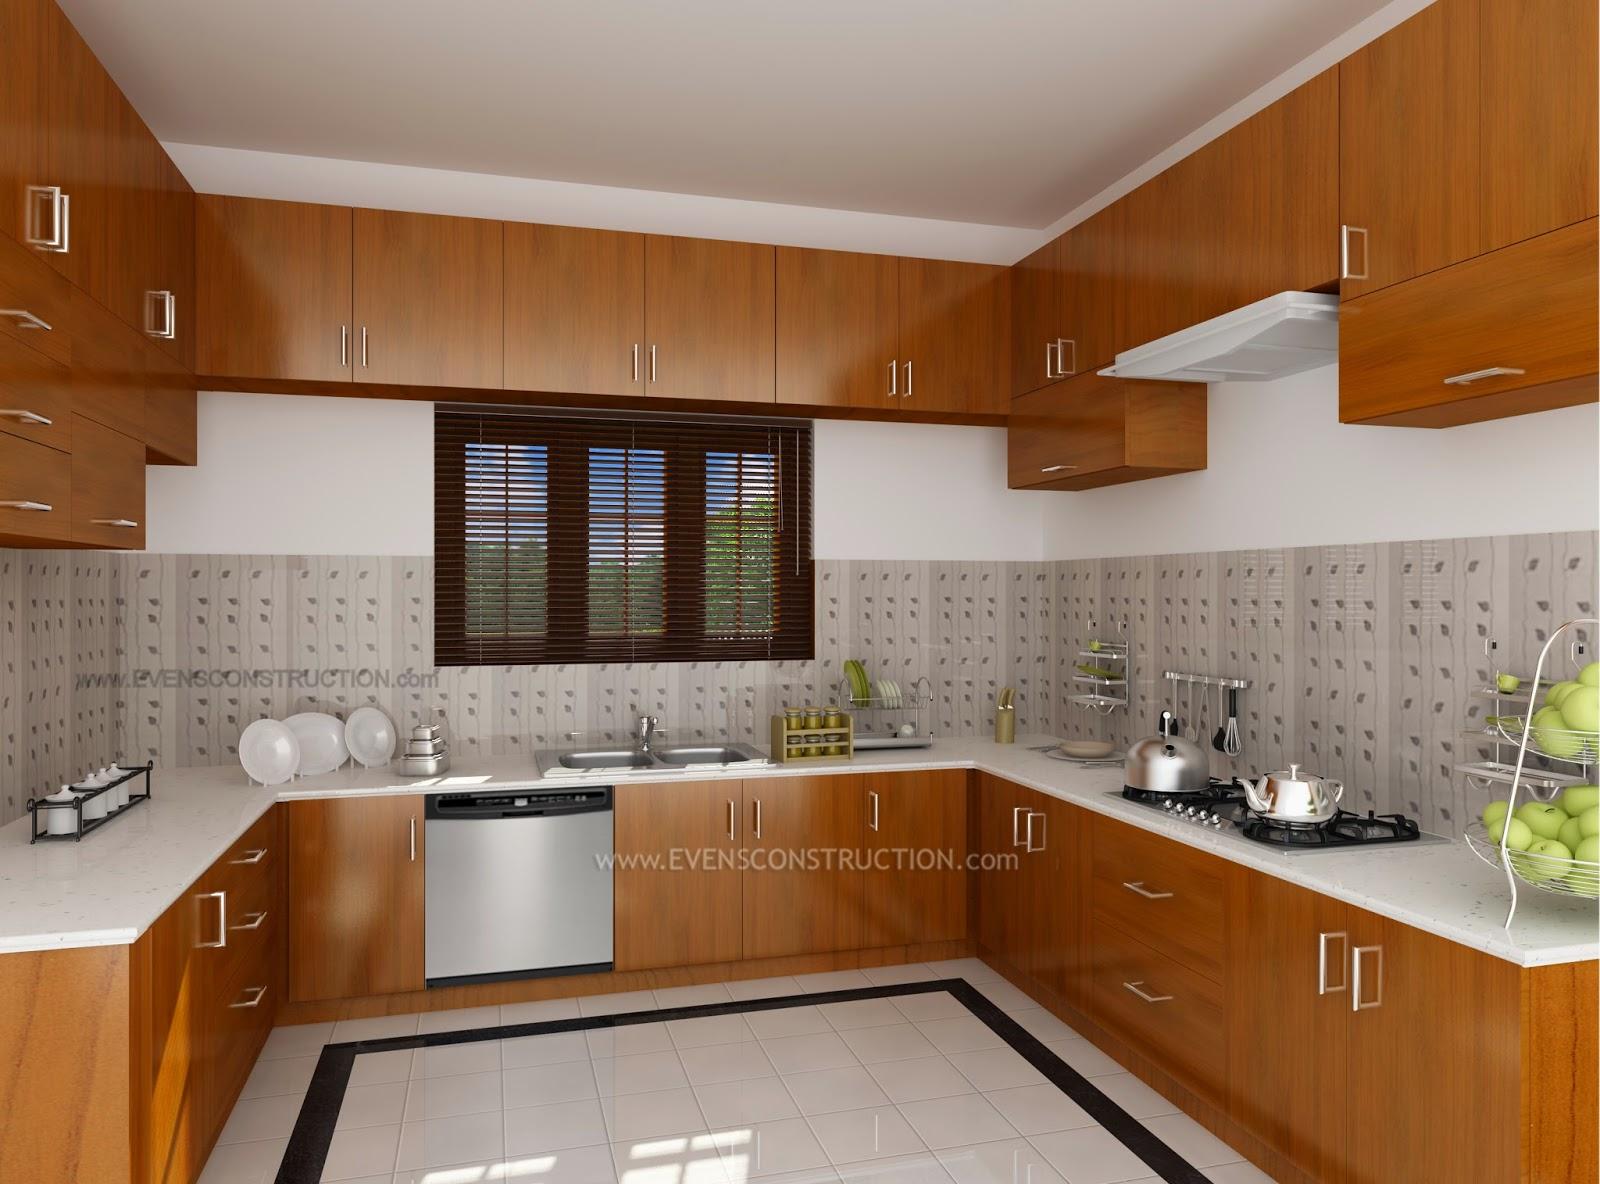 kerala kitchen interior design - modern bedroom ideas kids